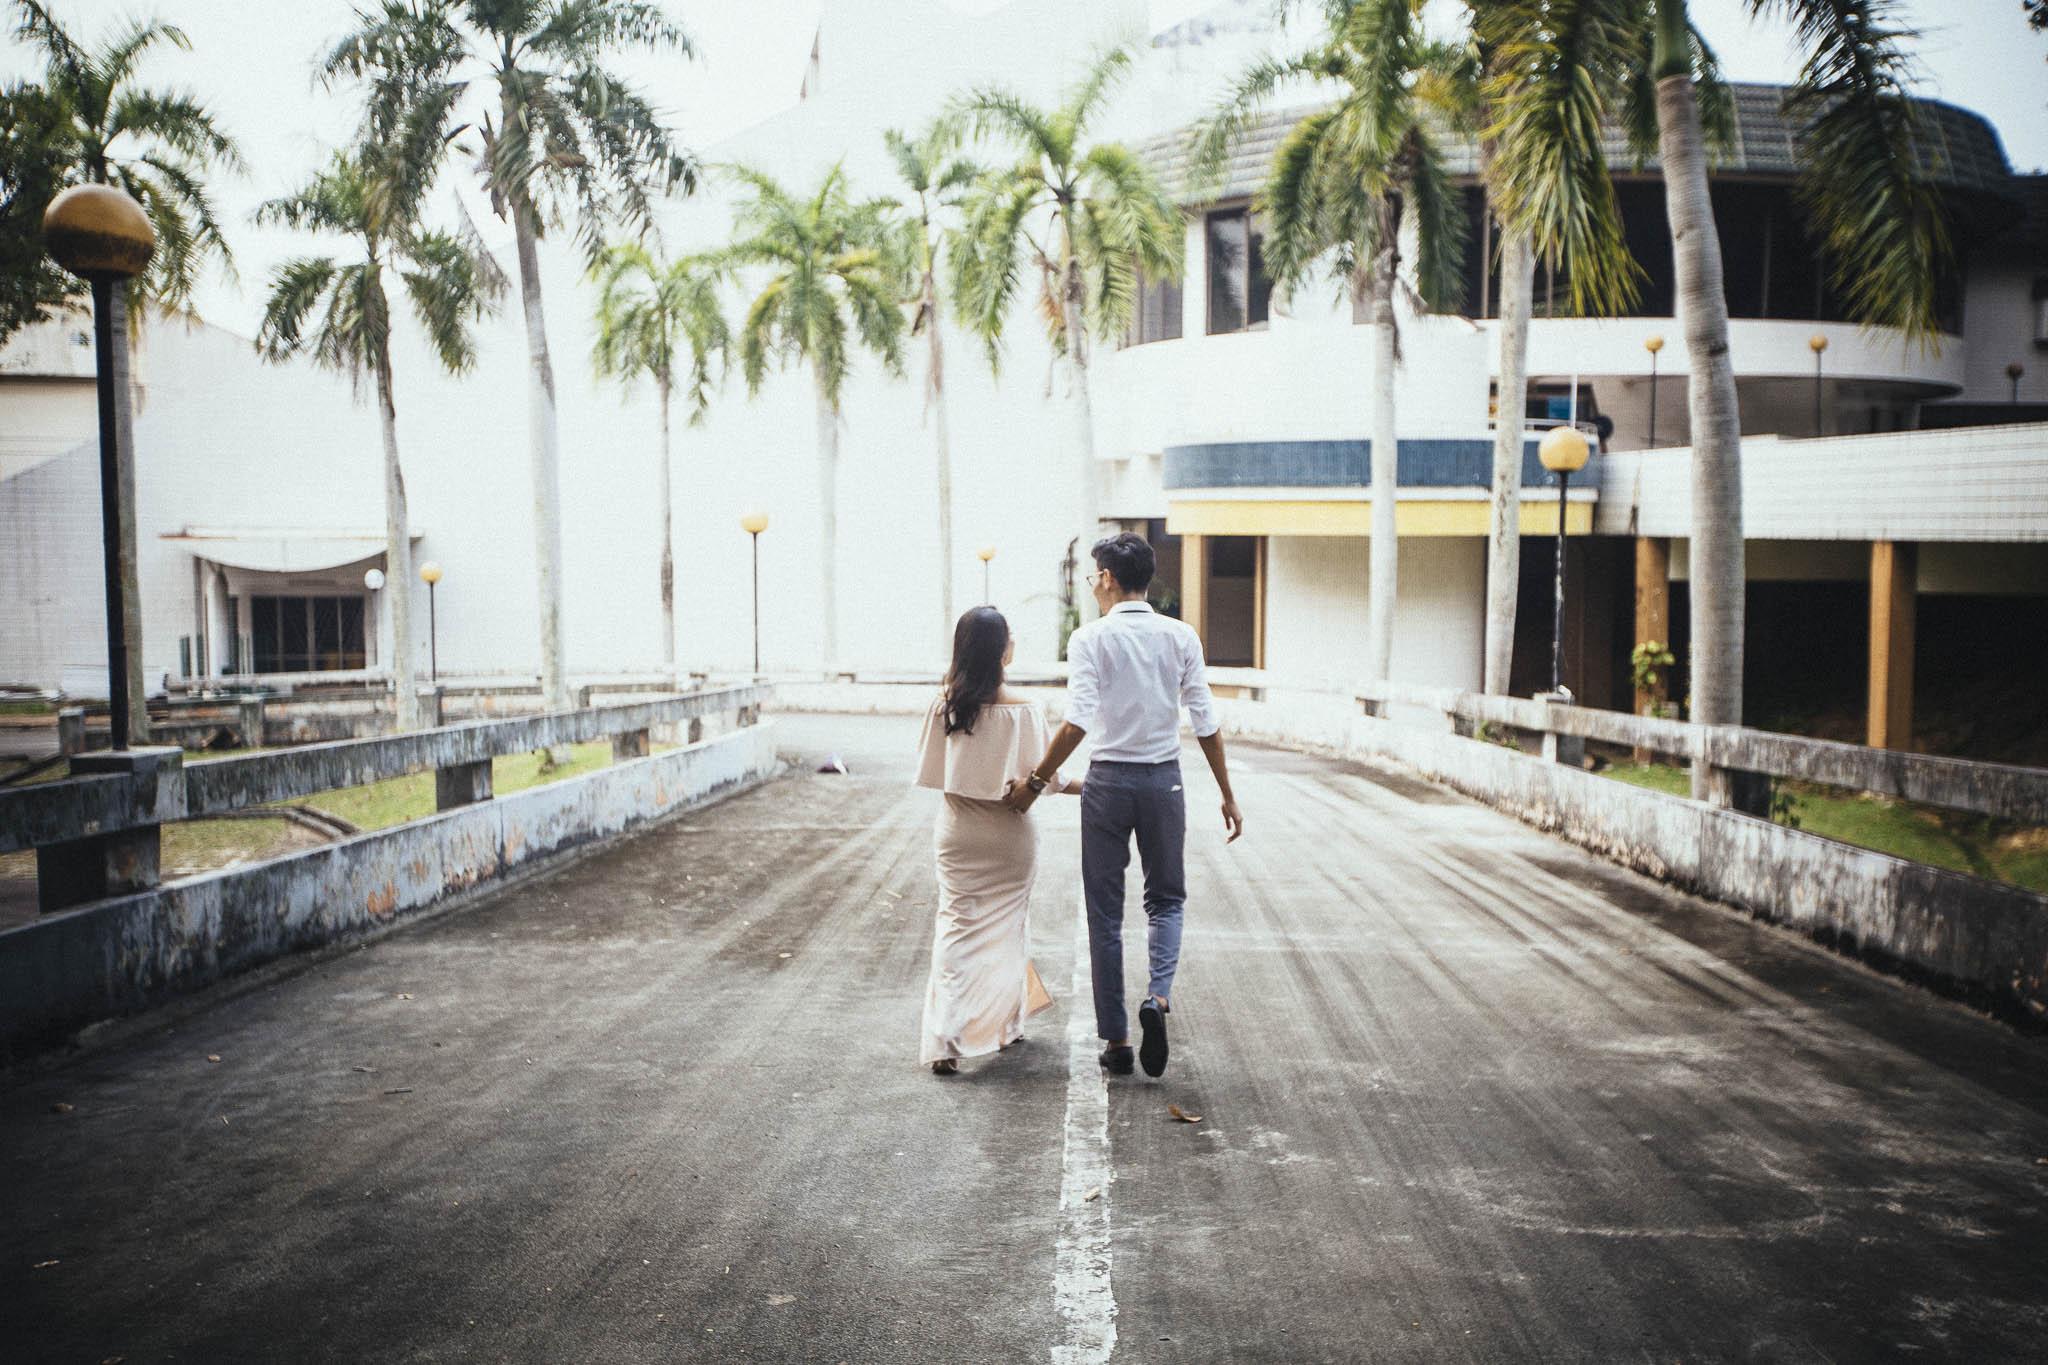 singapore-wedding-photographer-malay-travel-adli-tashah-15.jpg